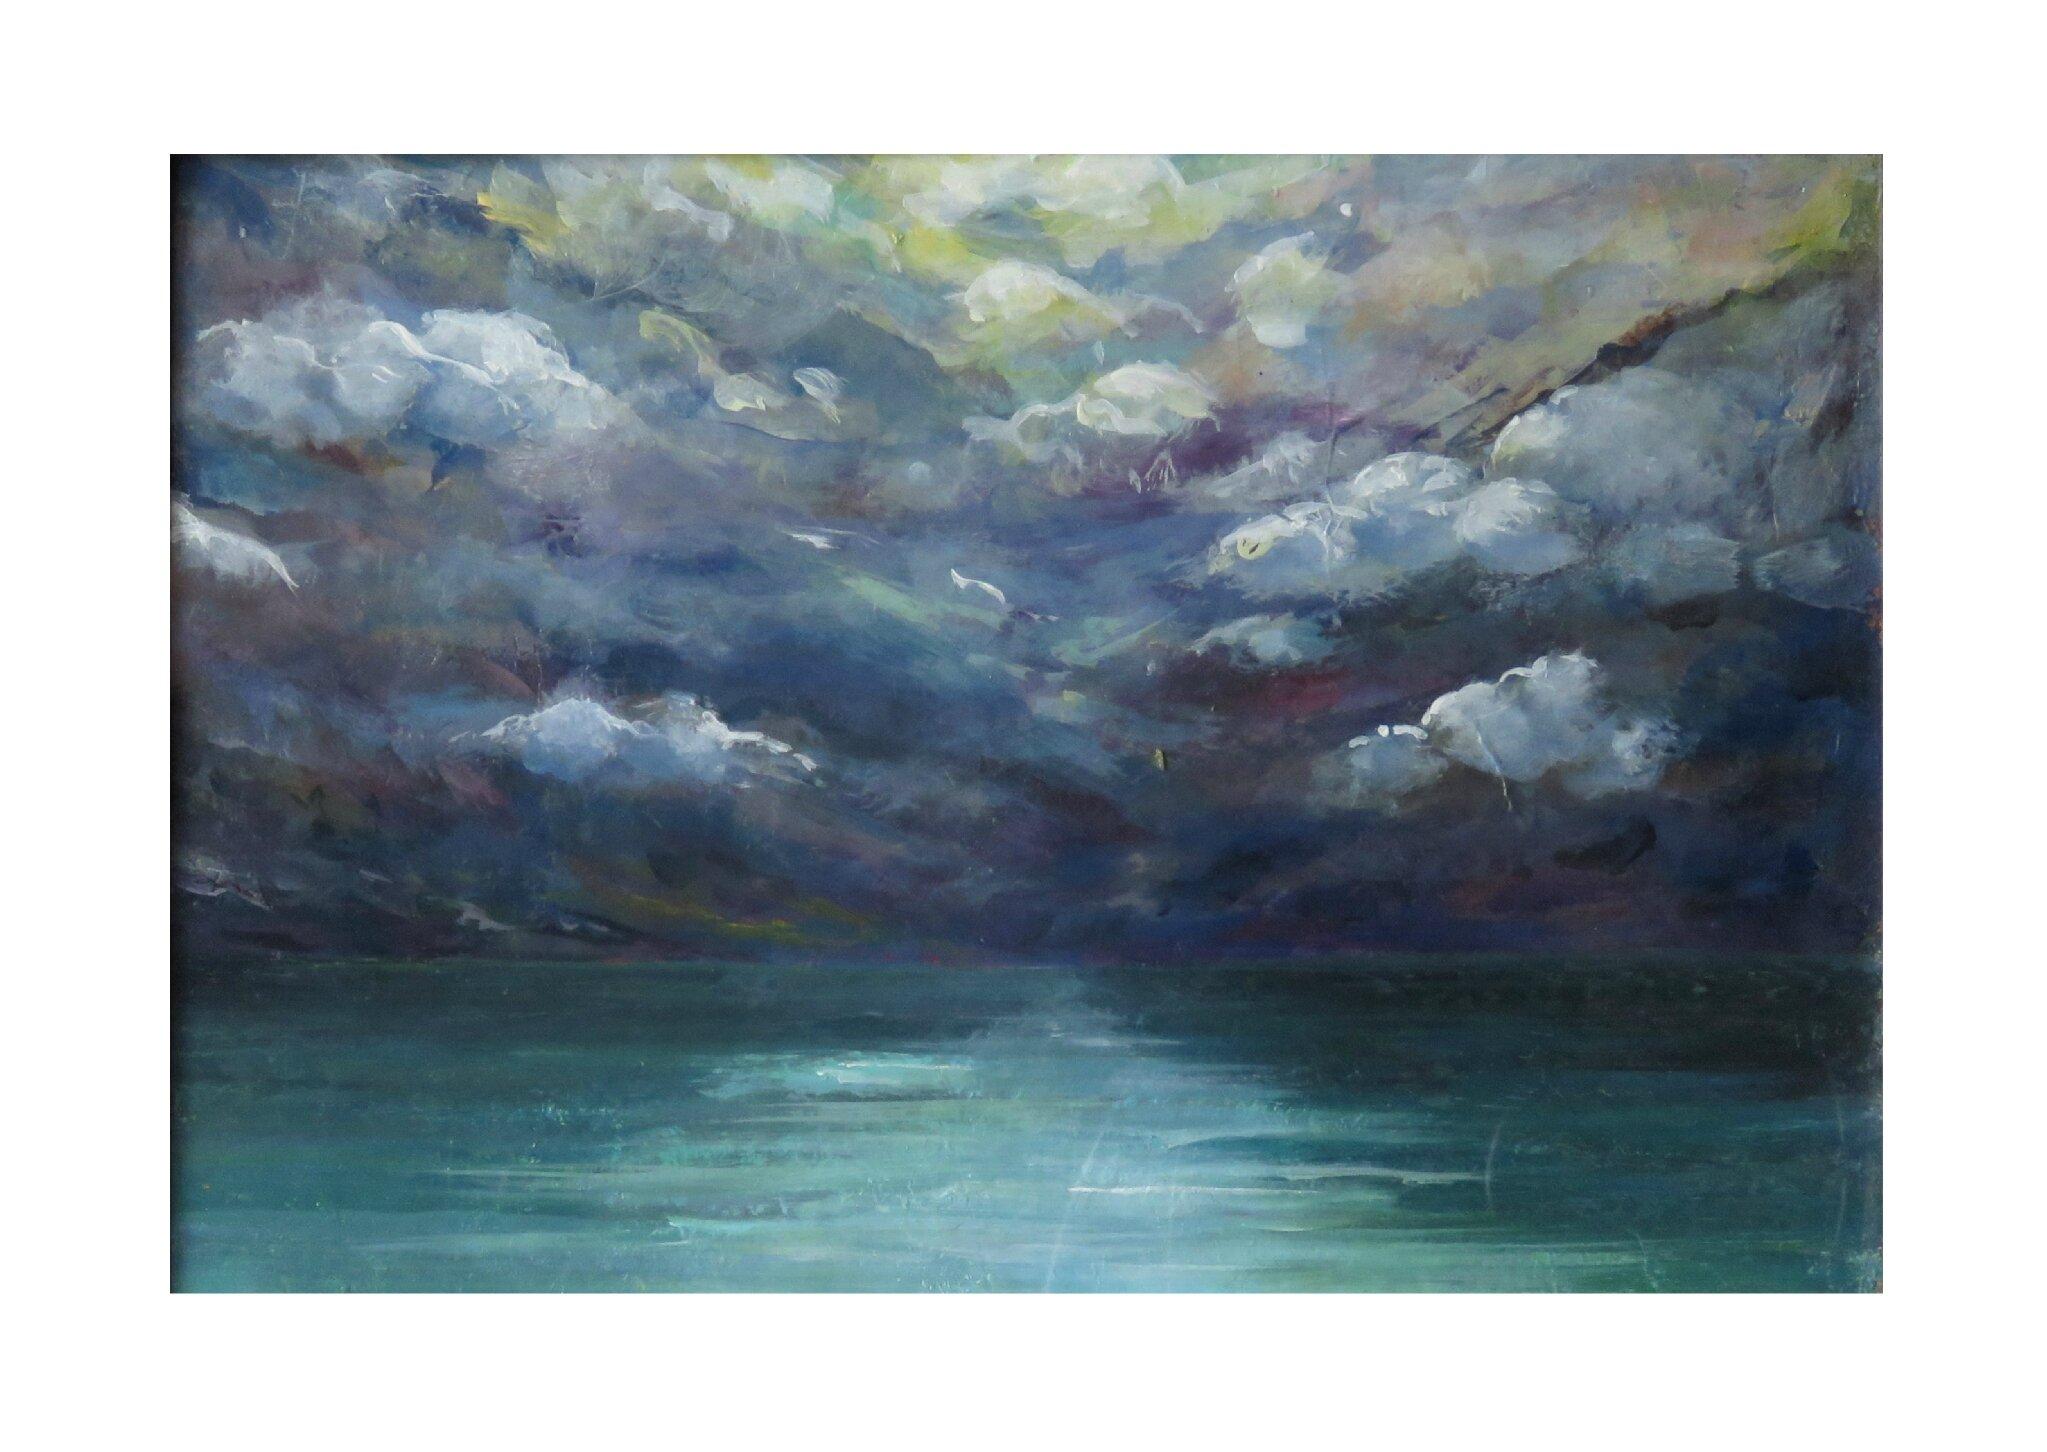 peinture figurative mer marine ciel orage eclaircie valerie albertosi